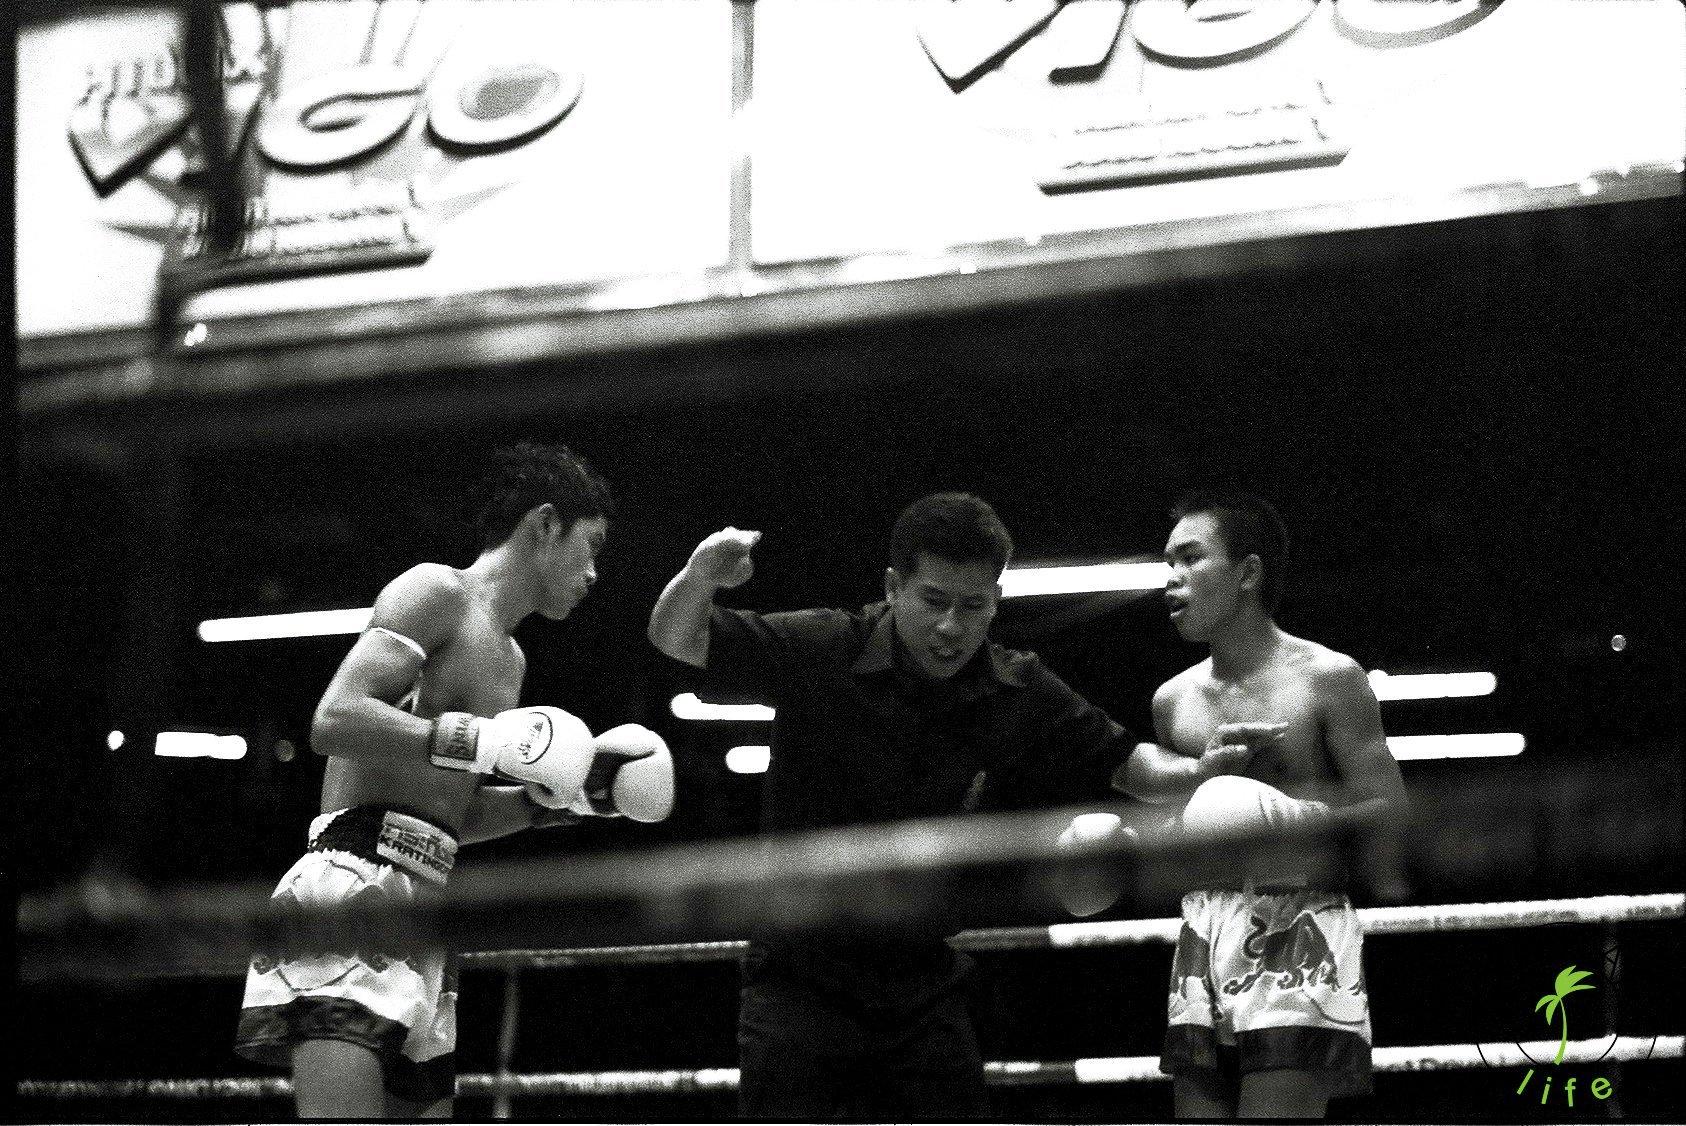 Walka muay thai w Bangkoku na Lumpini, klincz.